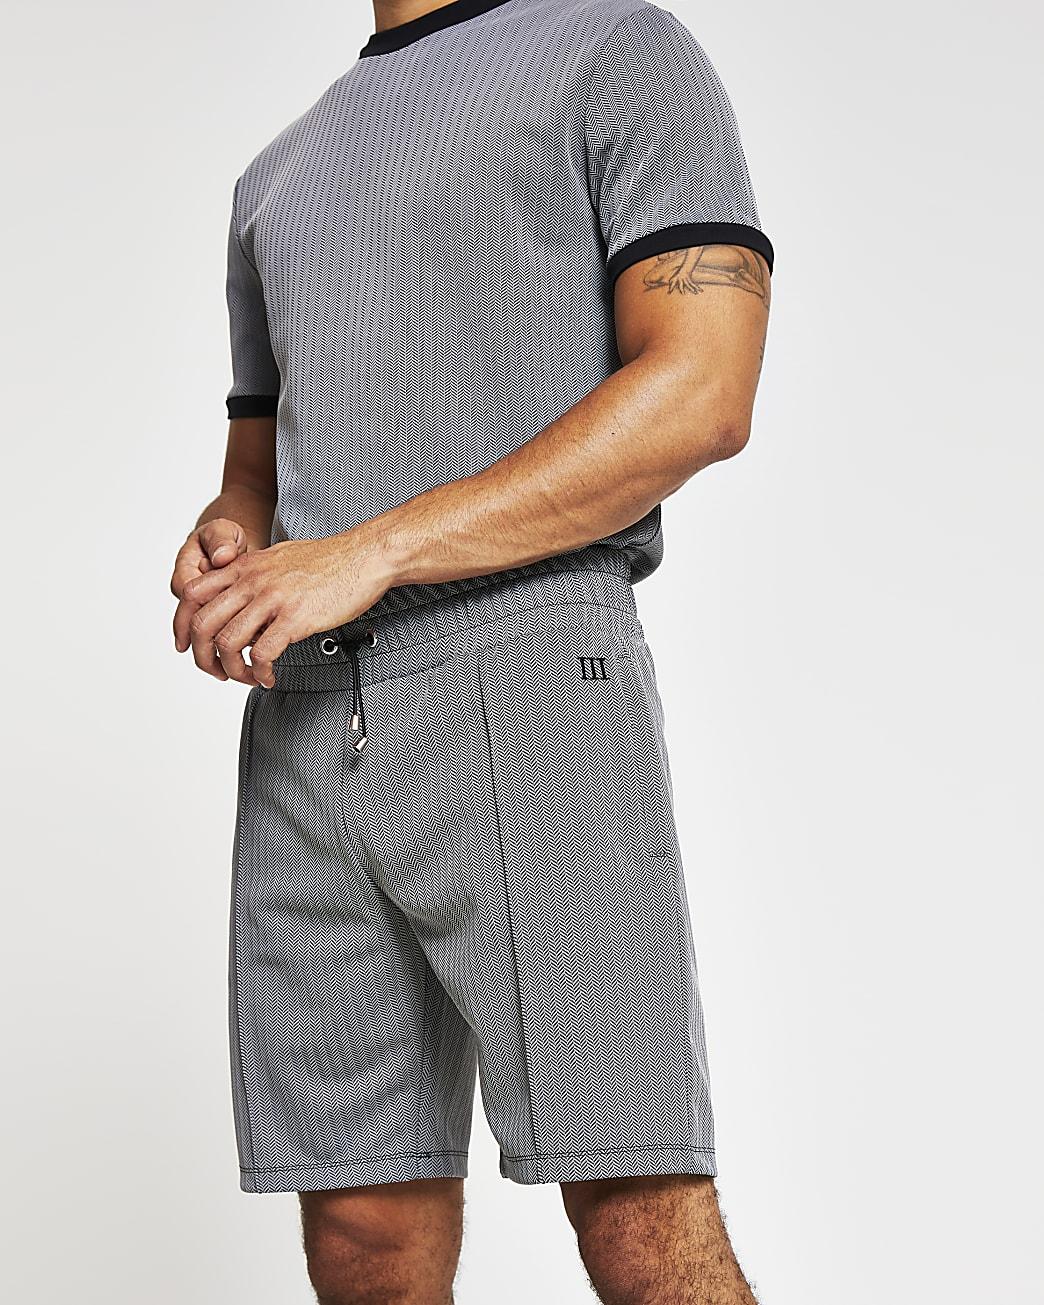 Maison Riviera grey jersey slim fit shorts